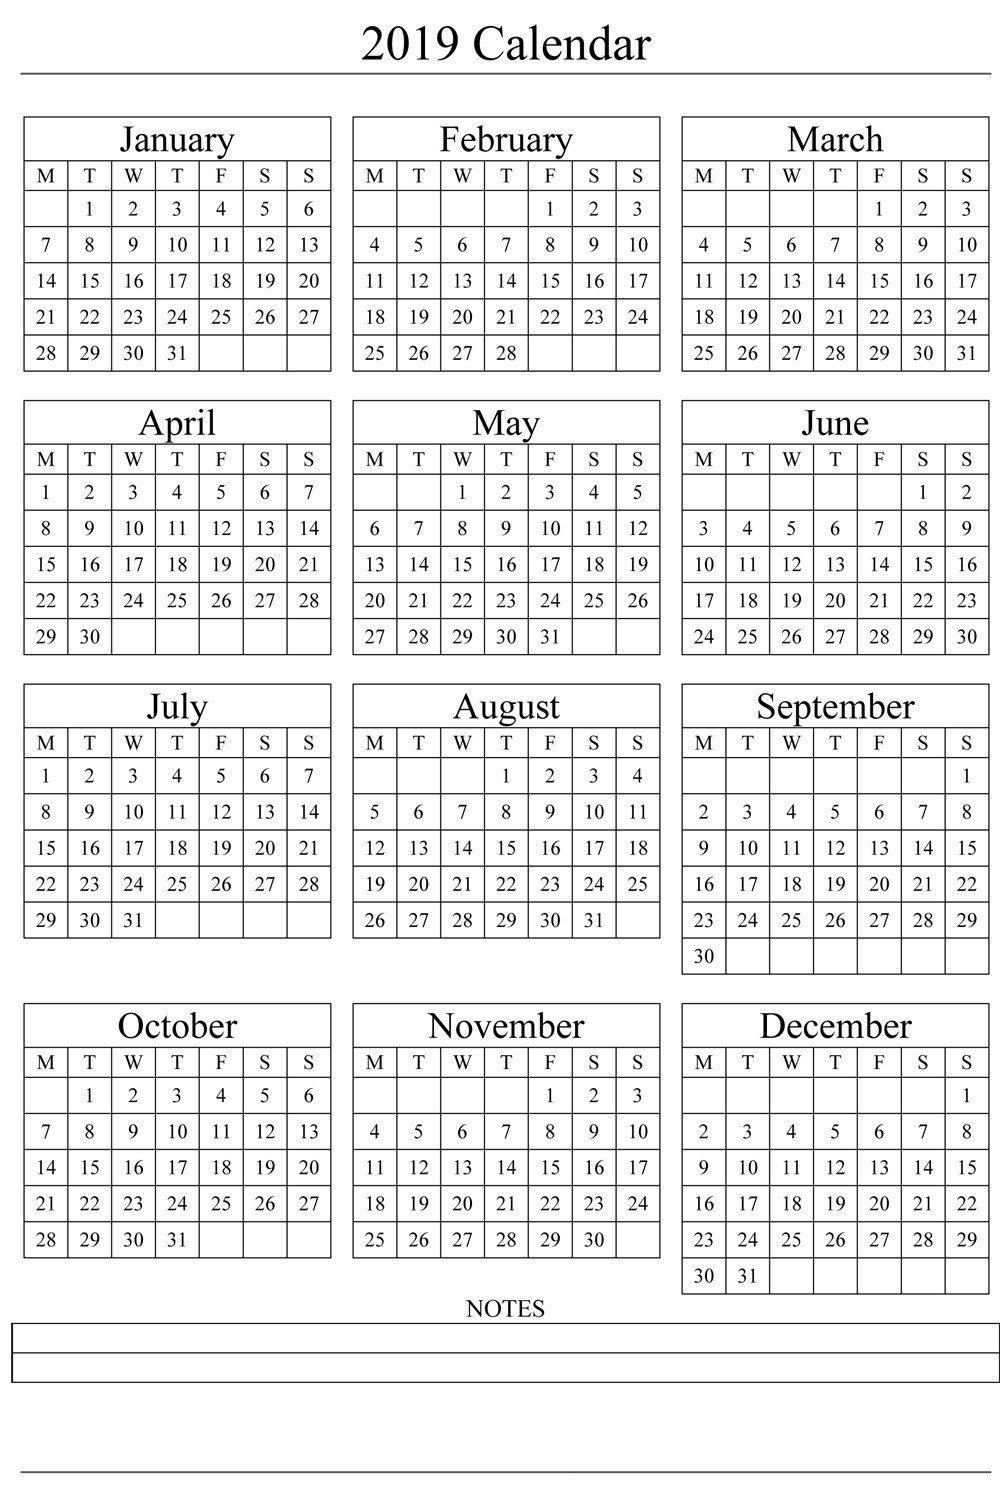 2019 Printable Calendar Templates – Blank Word Pdf – Calendar End Calendar Of 2019 Pdf